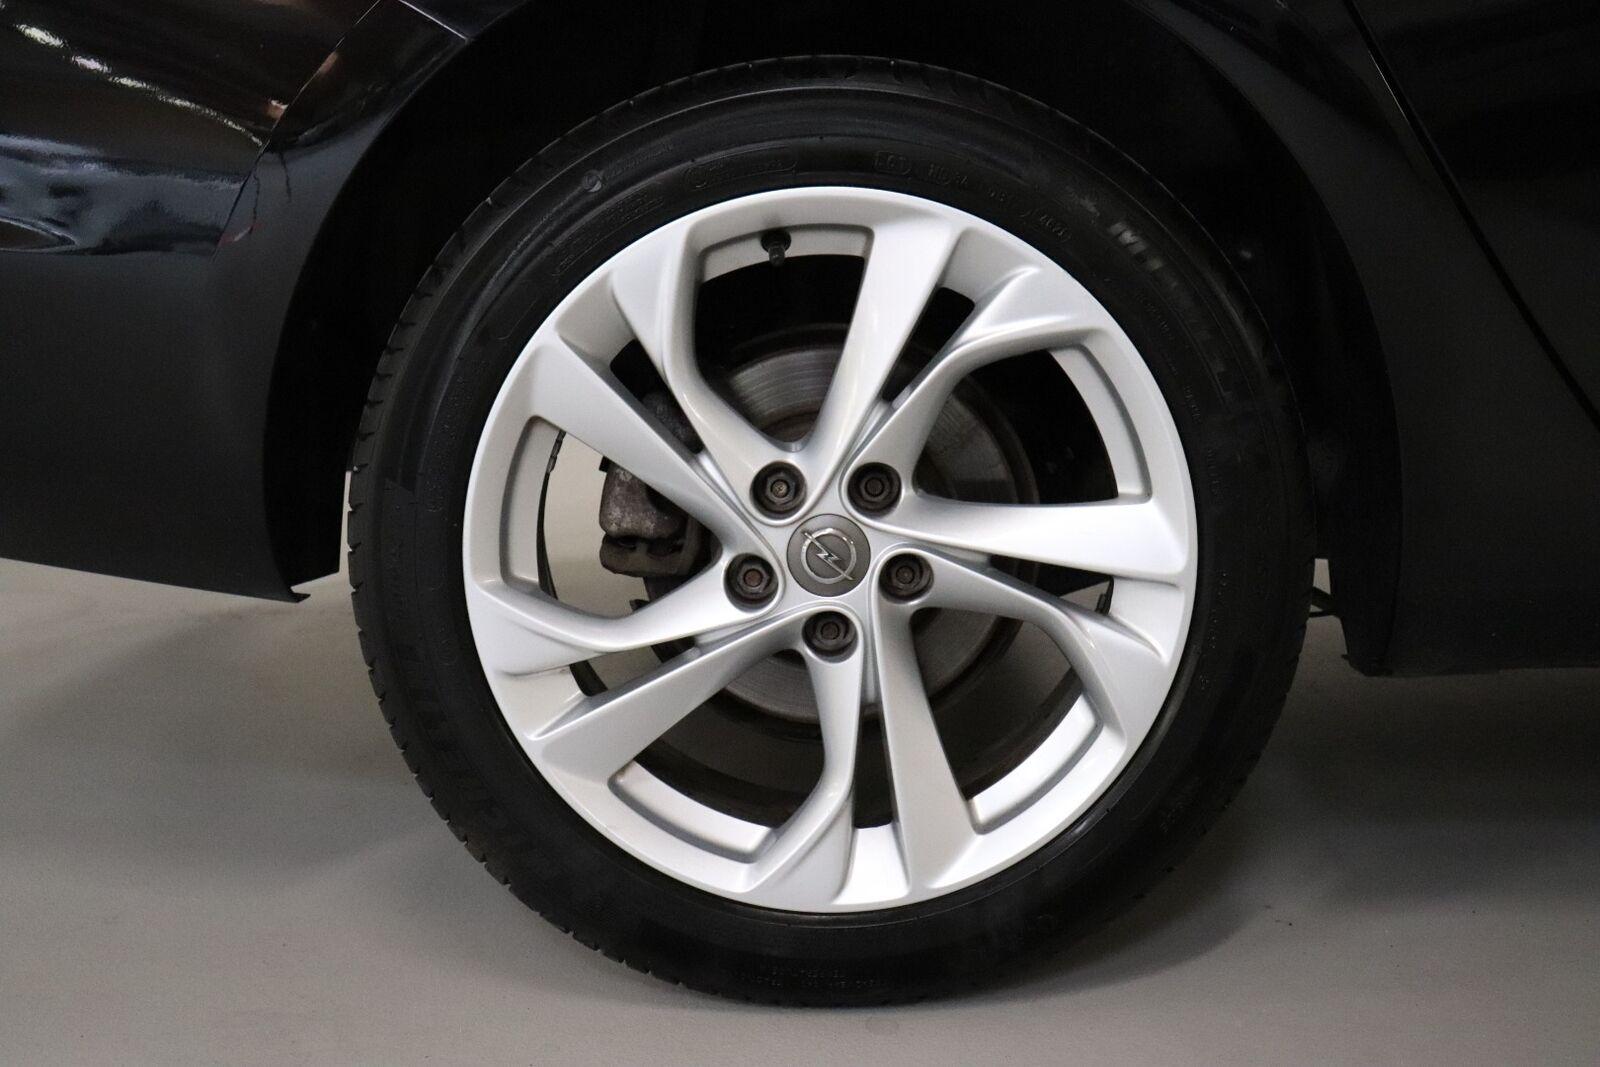 Opel Astra 1,6 CDTi 110 Edition Sports Tourer